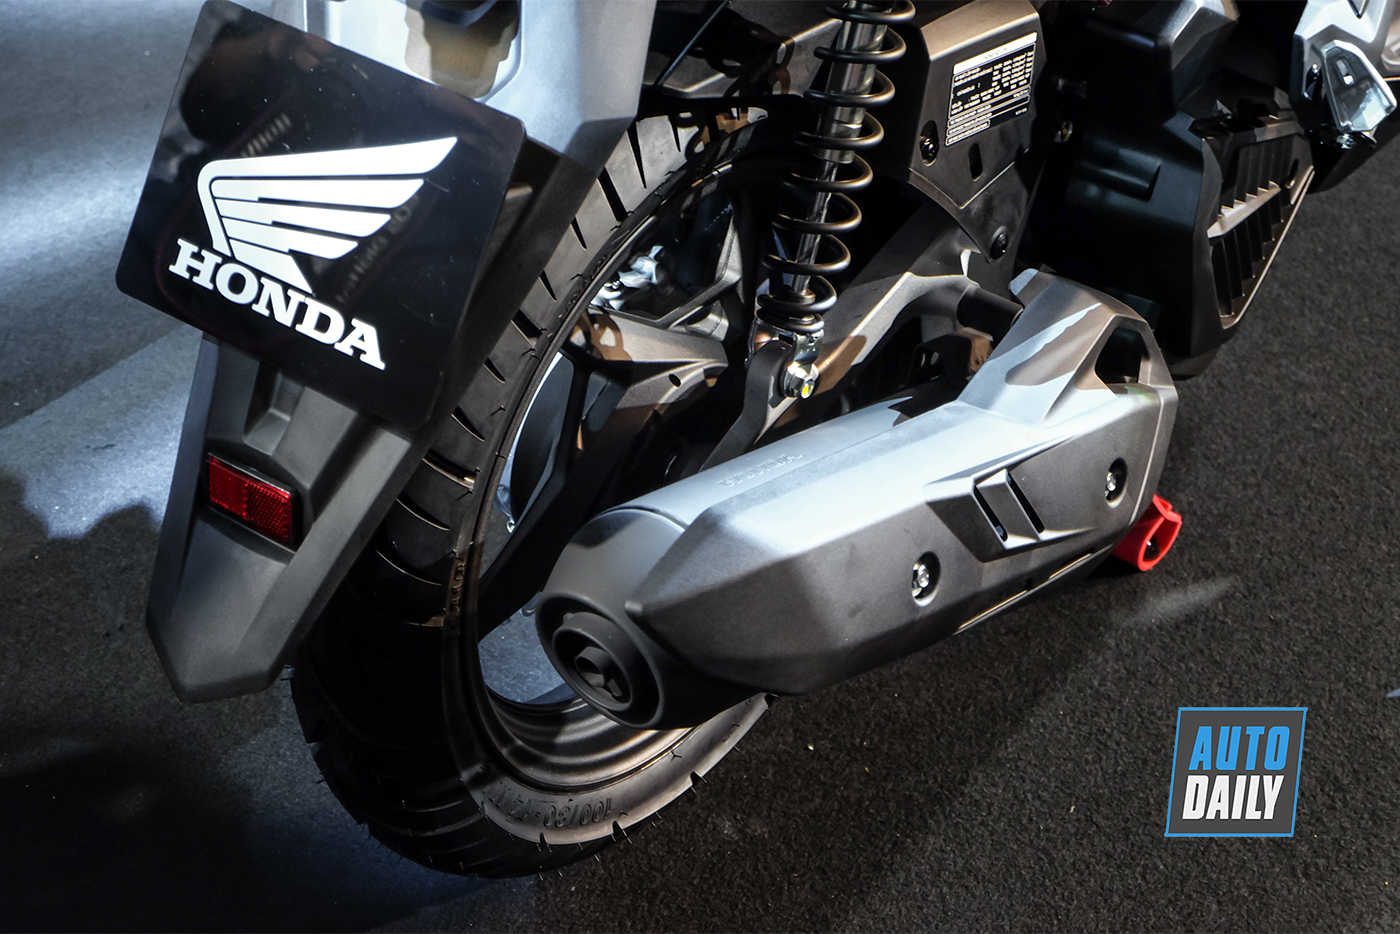 honda-airblade-2020-25.jpg